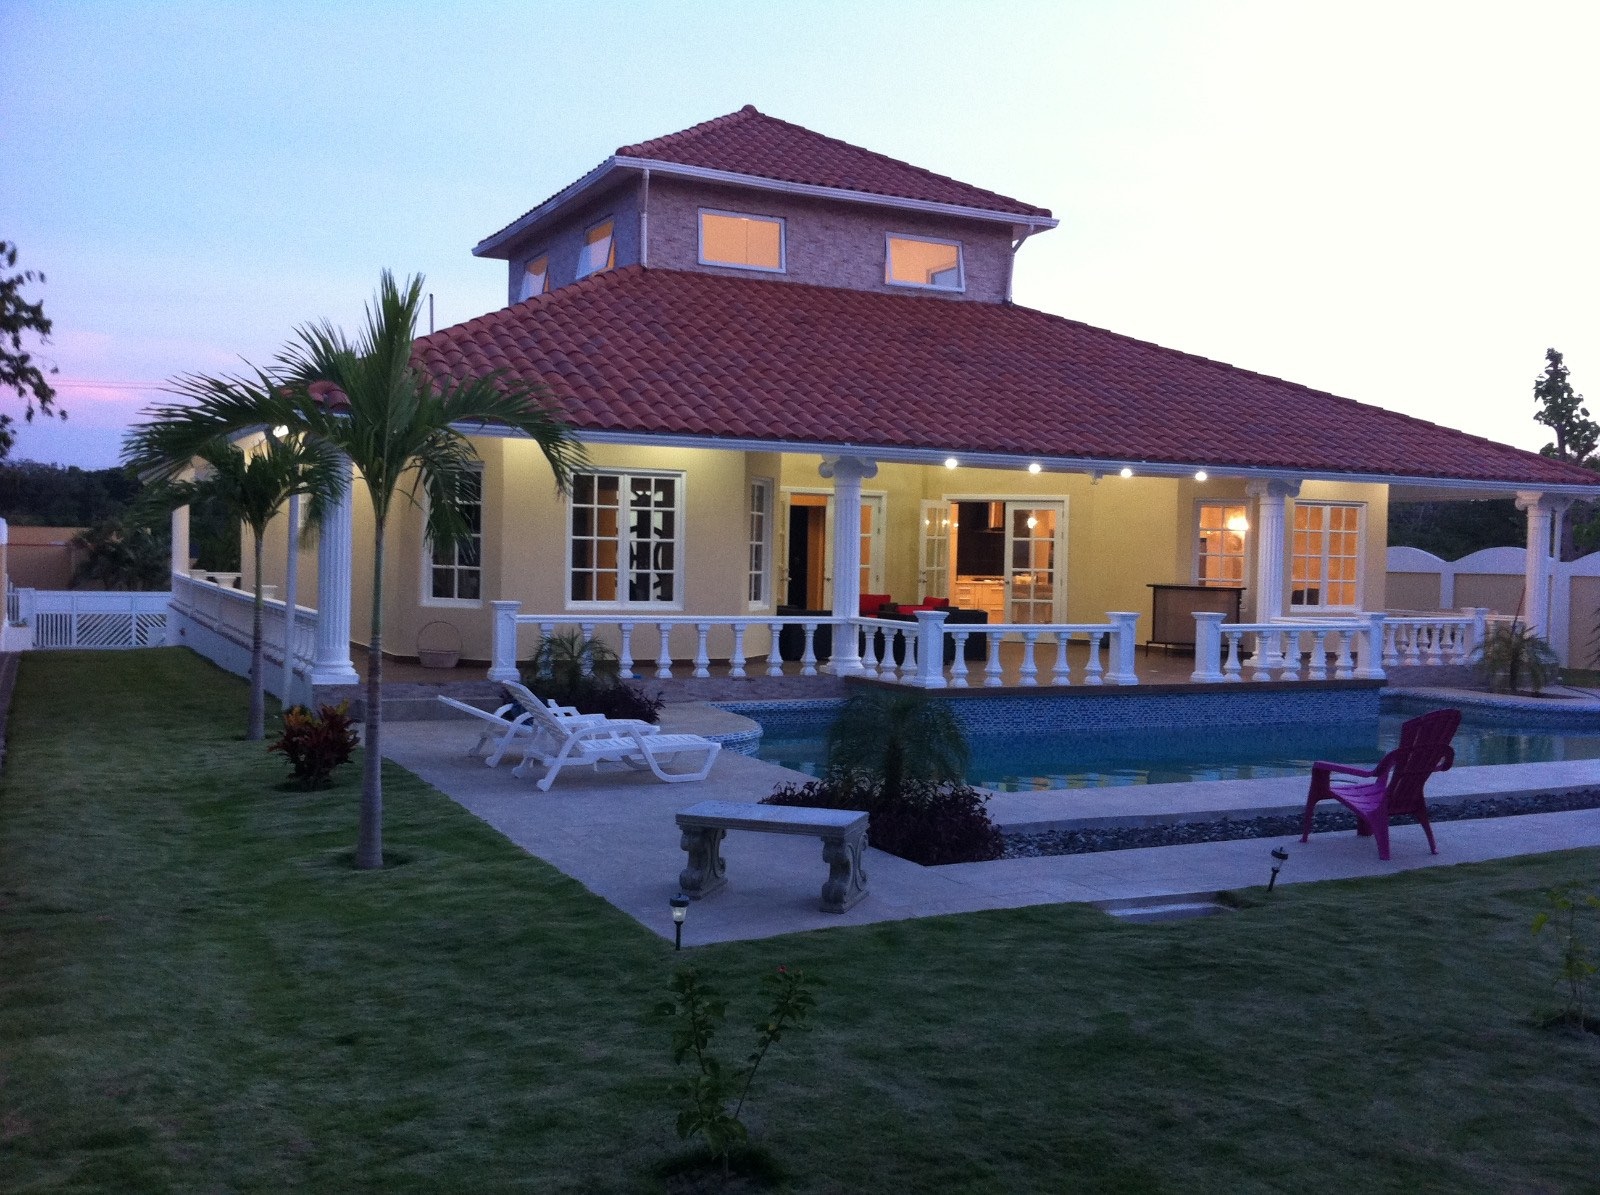 BEAUTIFUL HOUSE IN CORONADO